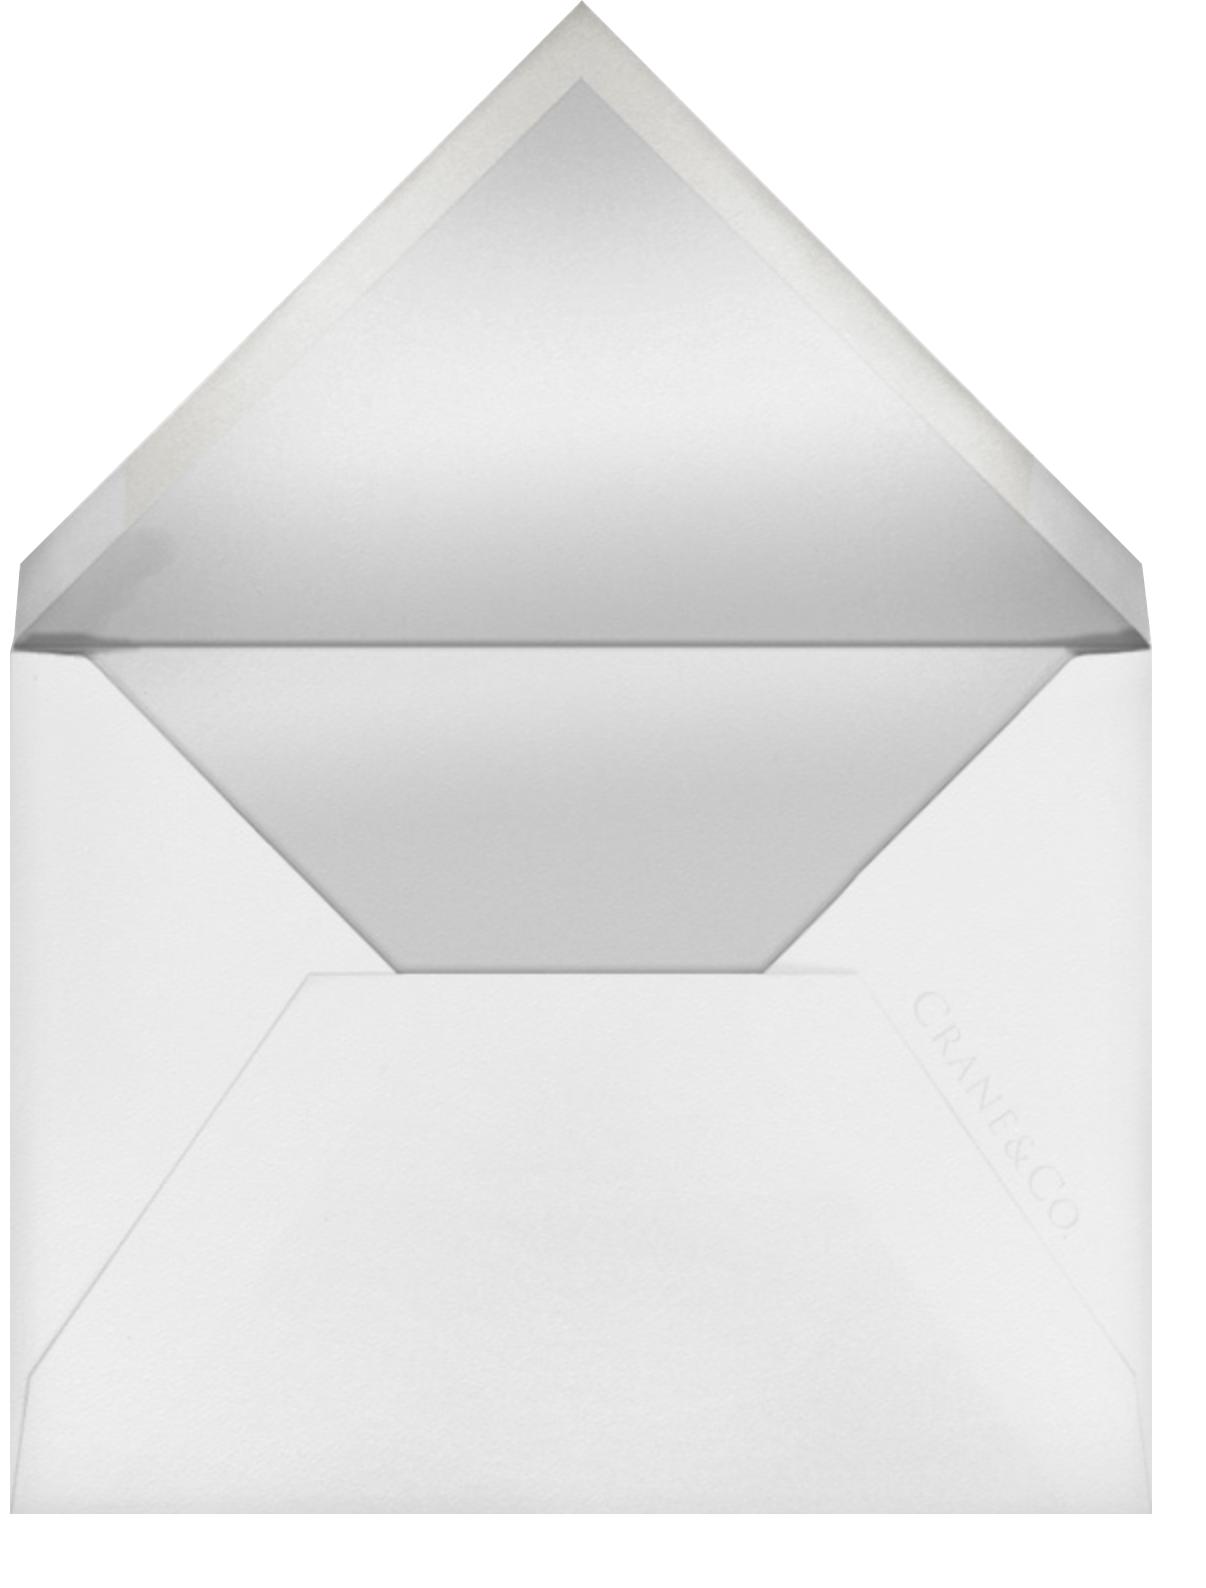 Whitby (Program) - Medium Gold - Paperless Post - Menus and programs - envelope back